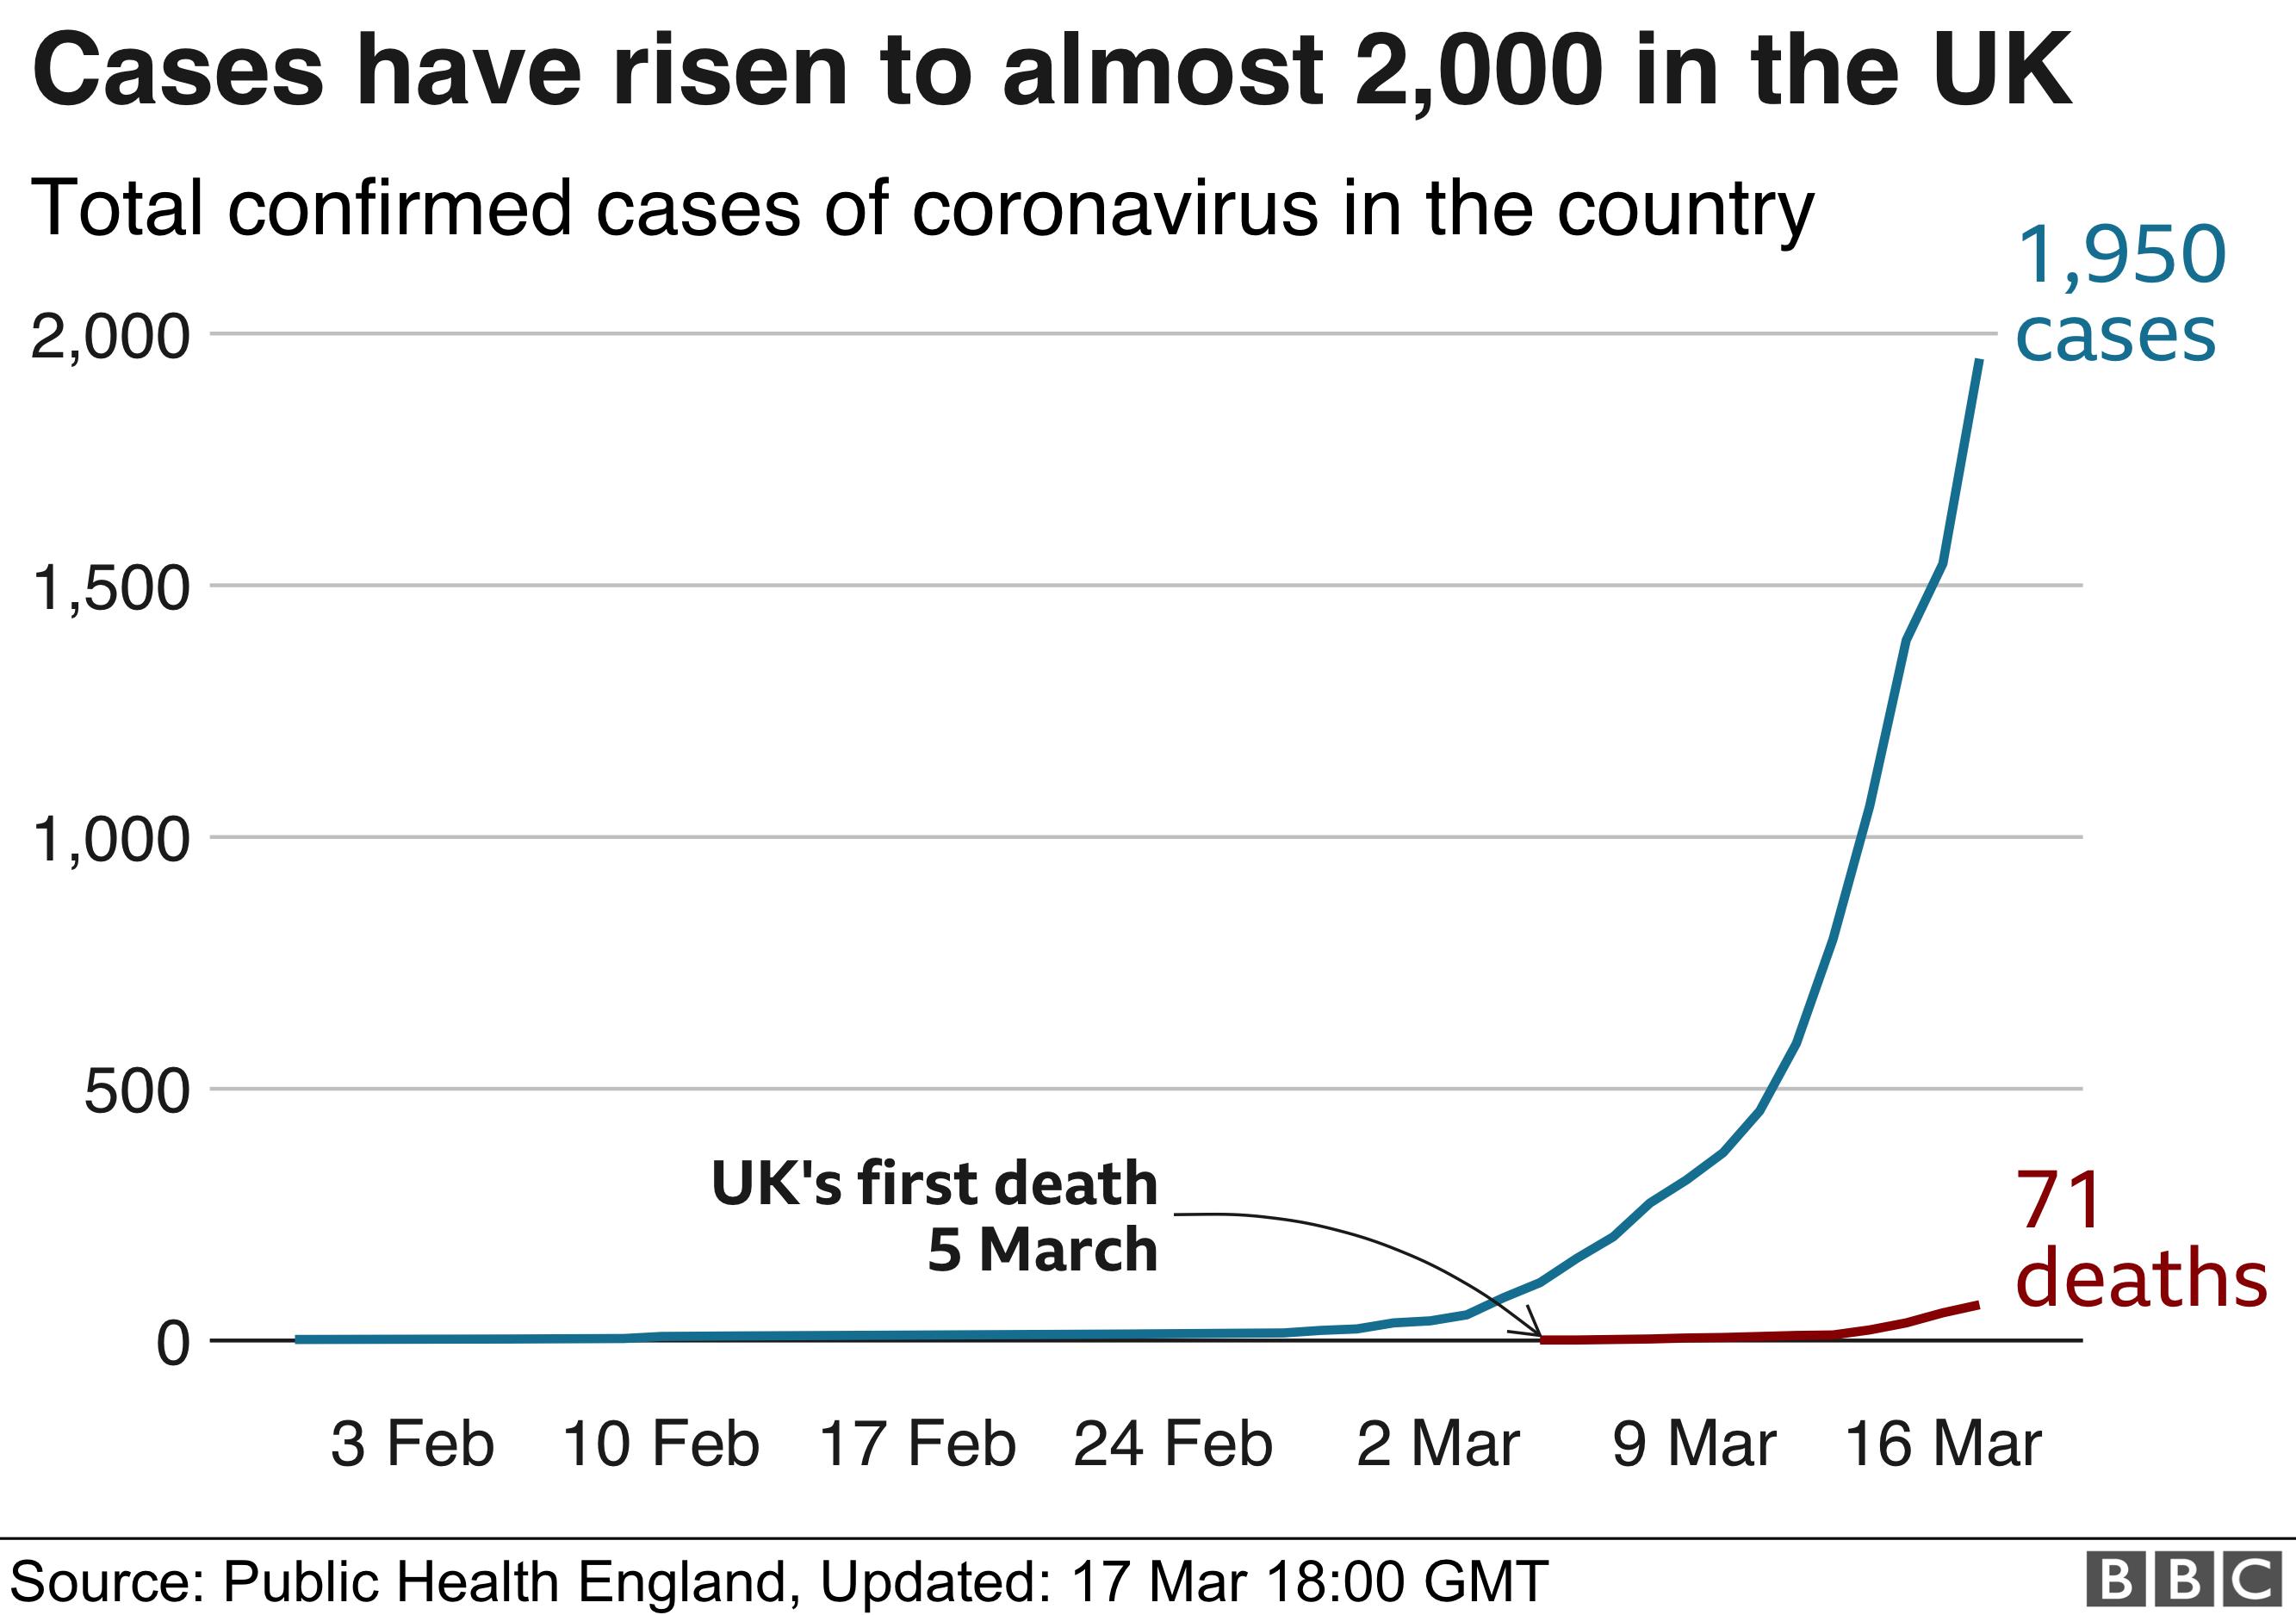 Chart on UK cases of coronavirus